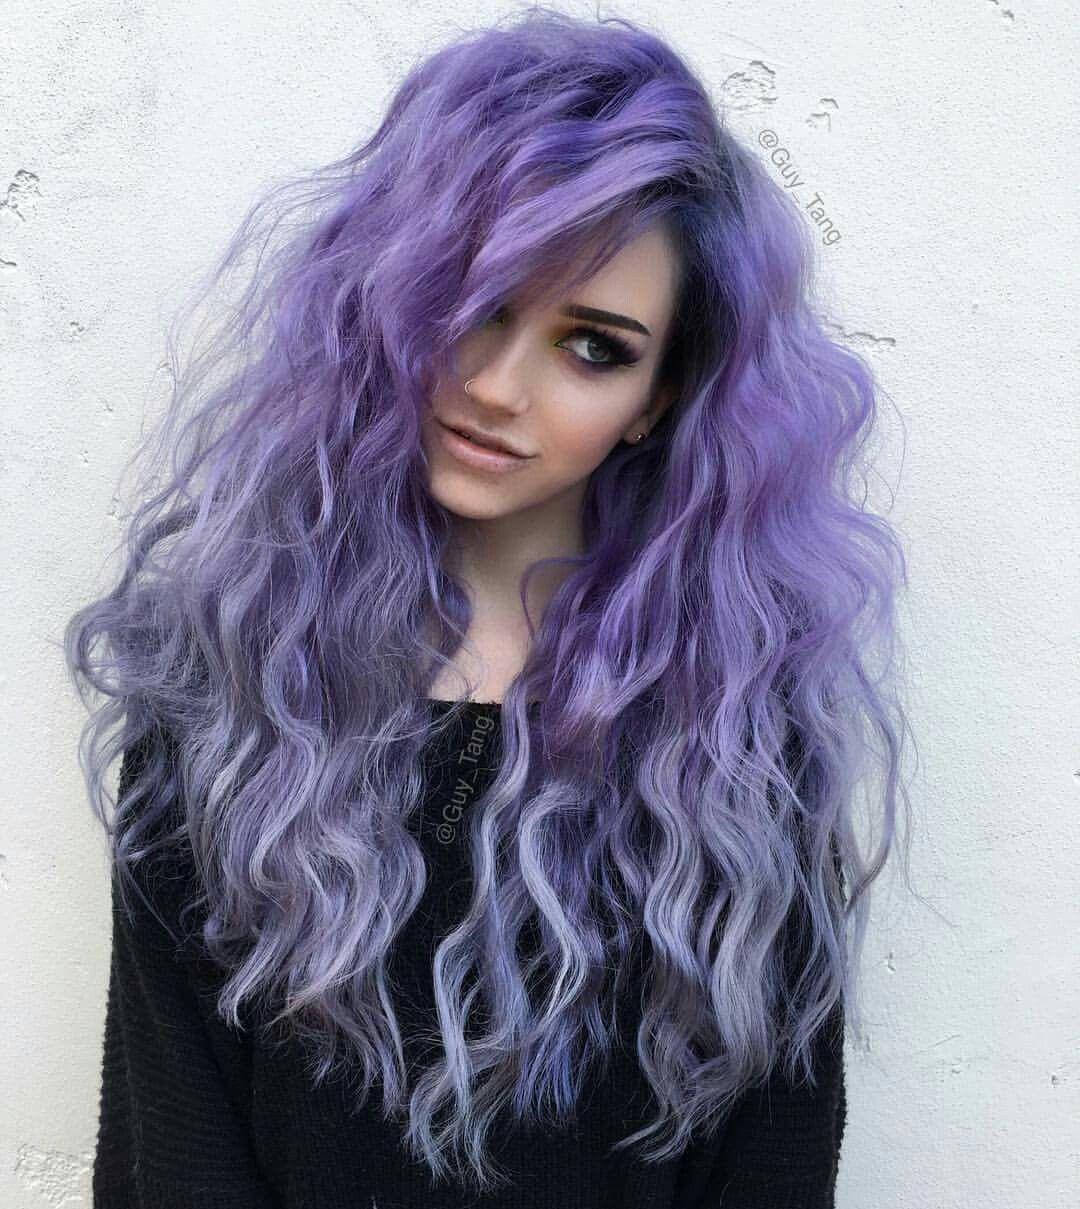 I Loooooooove This Purple Curly Hair Lilac Hair Violet Hair Colors Hair Styles